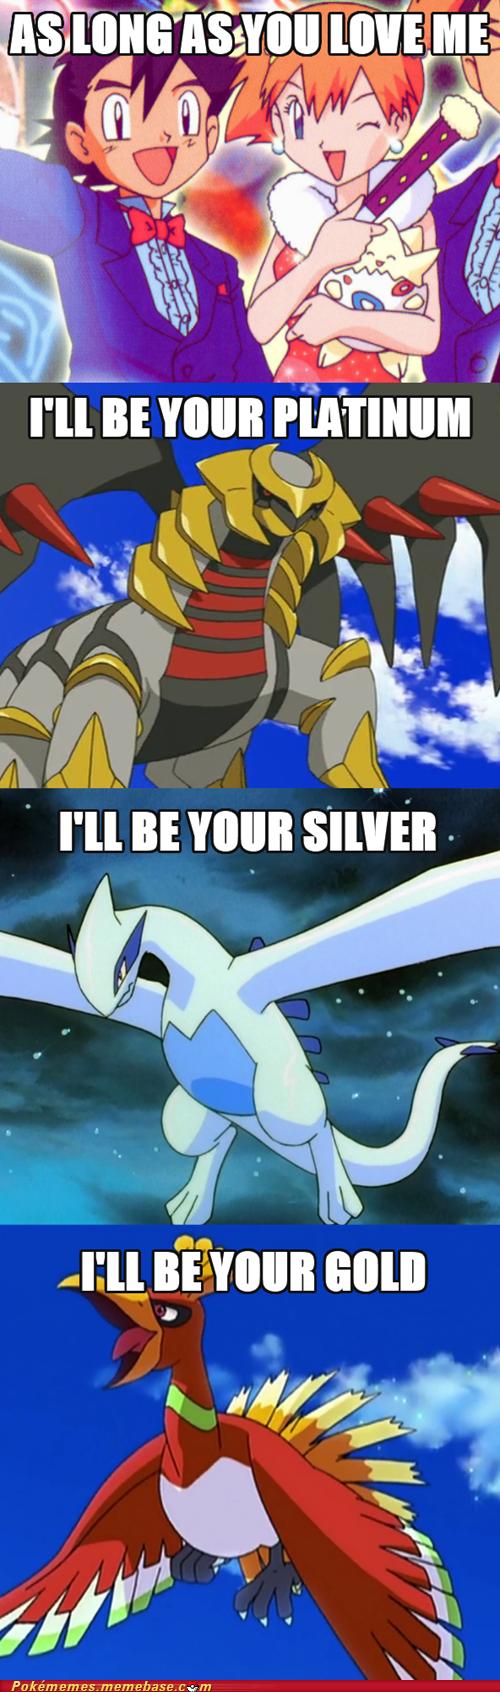 gold justin bieber silver Pokémon platinum - 7335324416